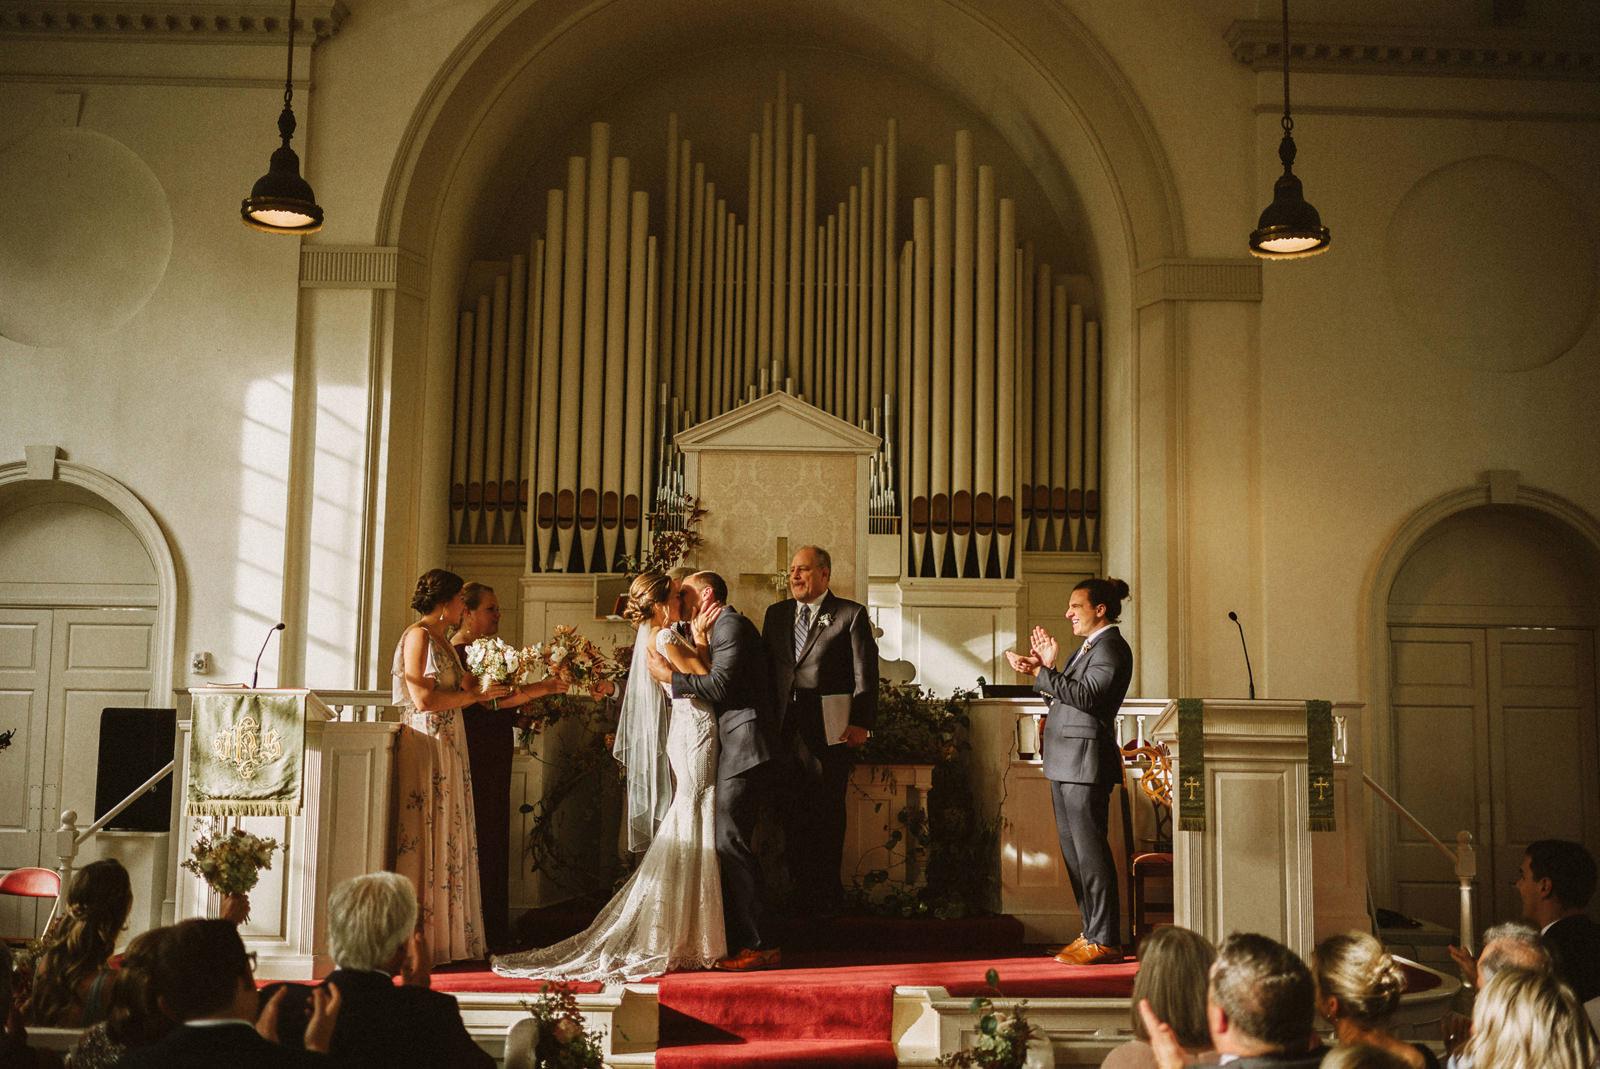 bridgeport-wedding-079 BRIDGEPORT, CONNECTICUT BACKYARD WEDDING